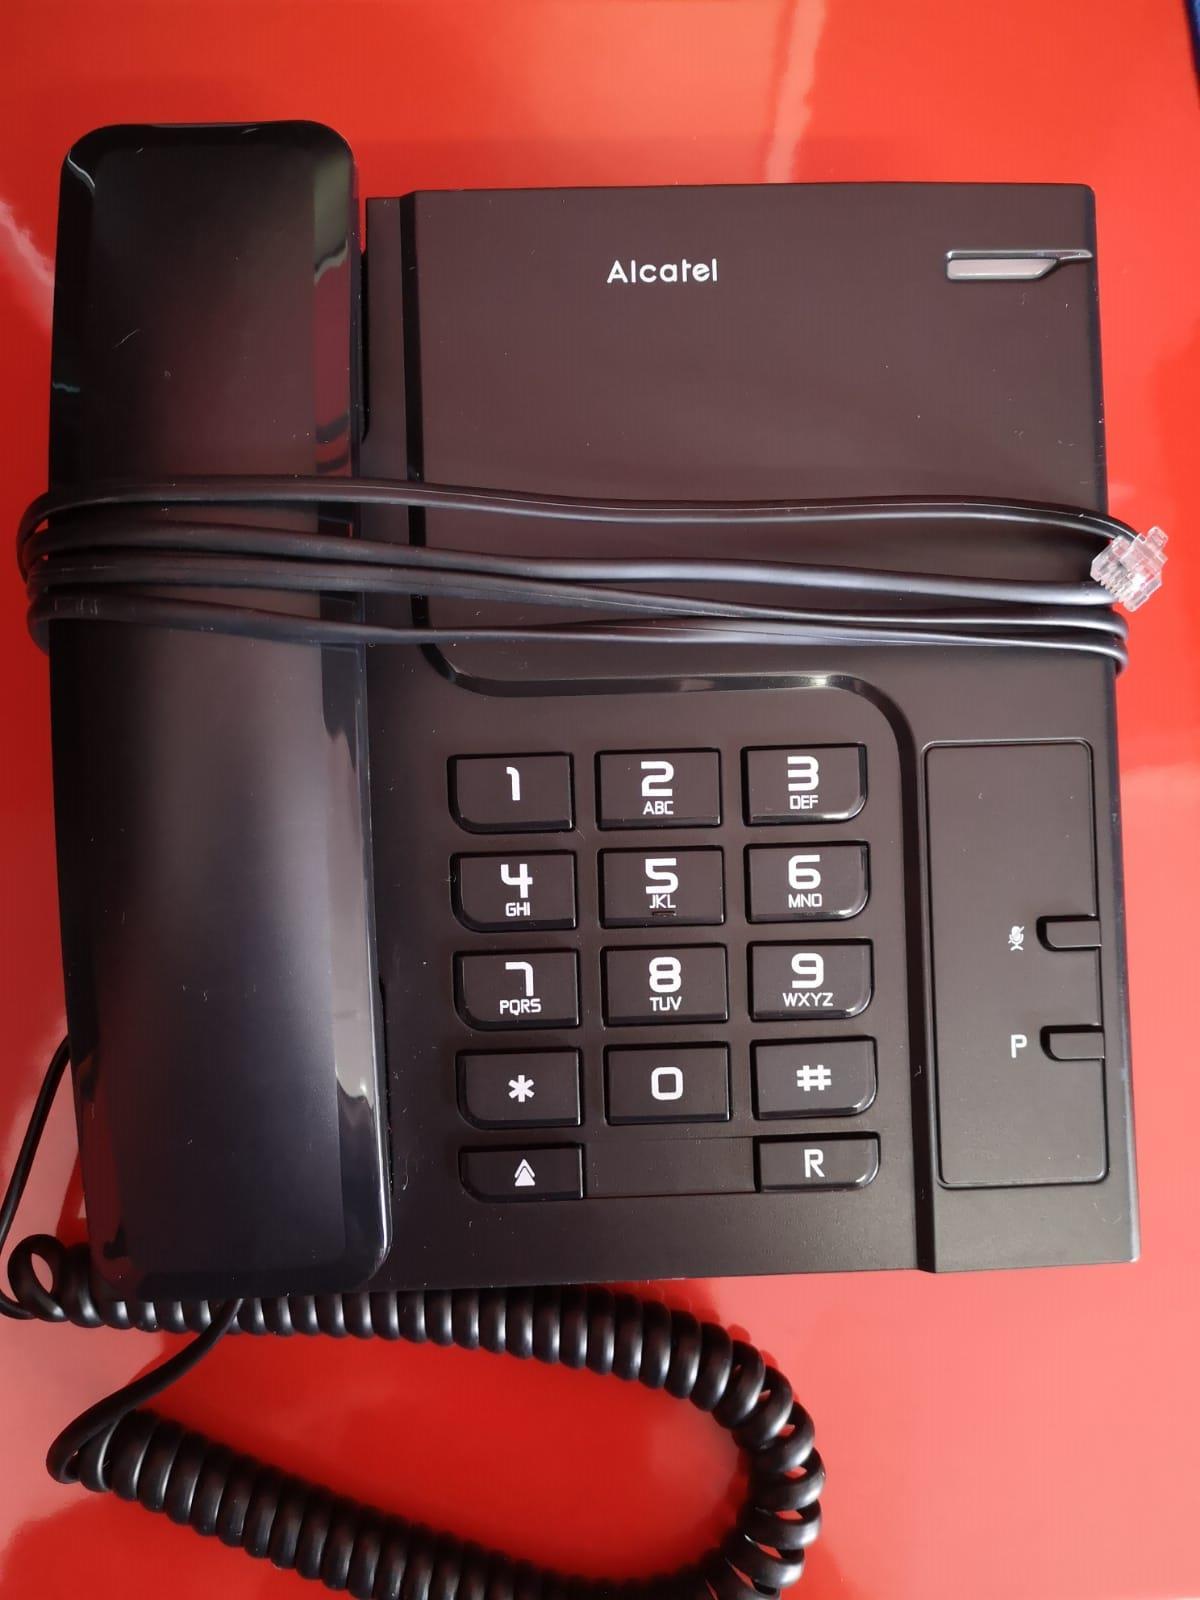 Alcatel T26 Corded Landline Phone (Black)